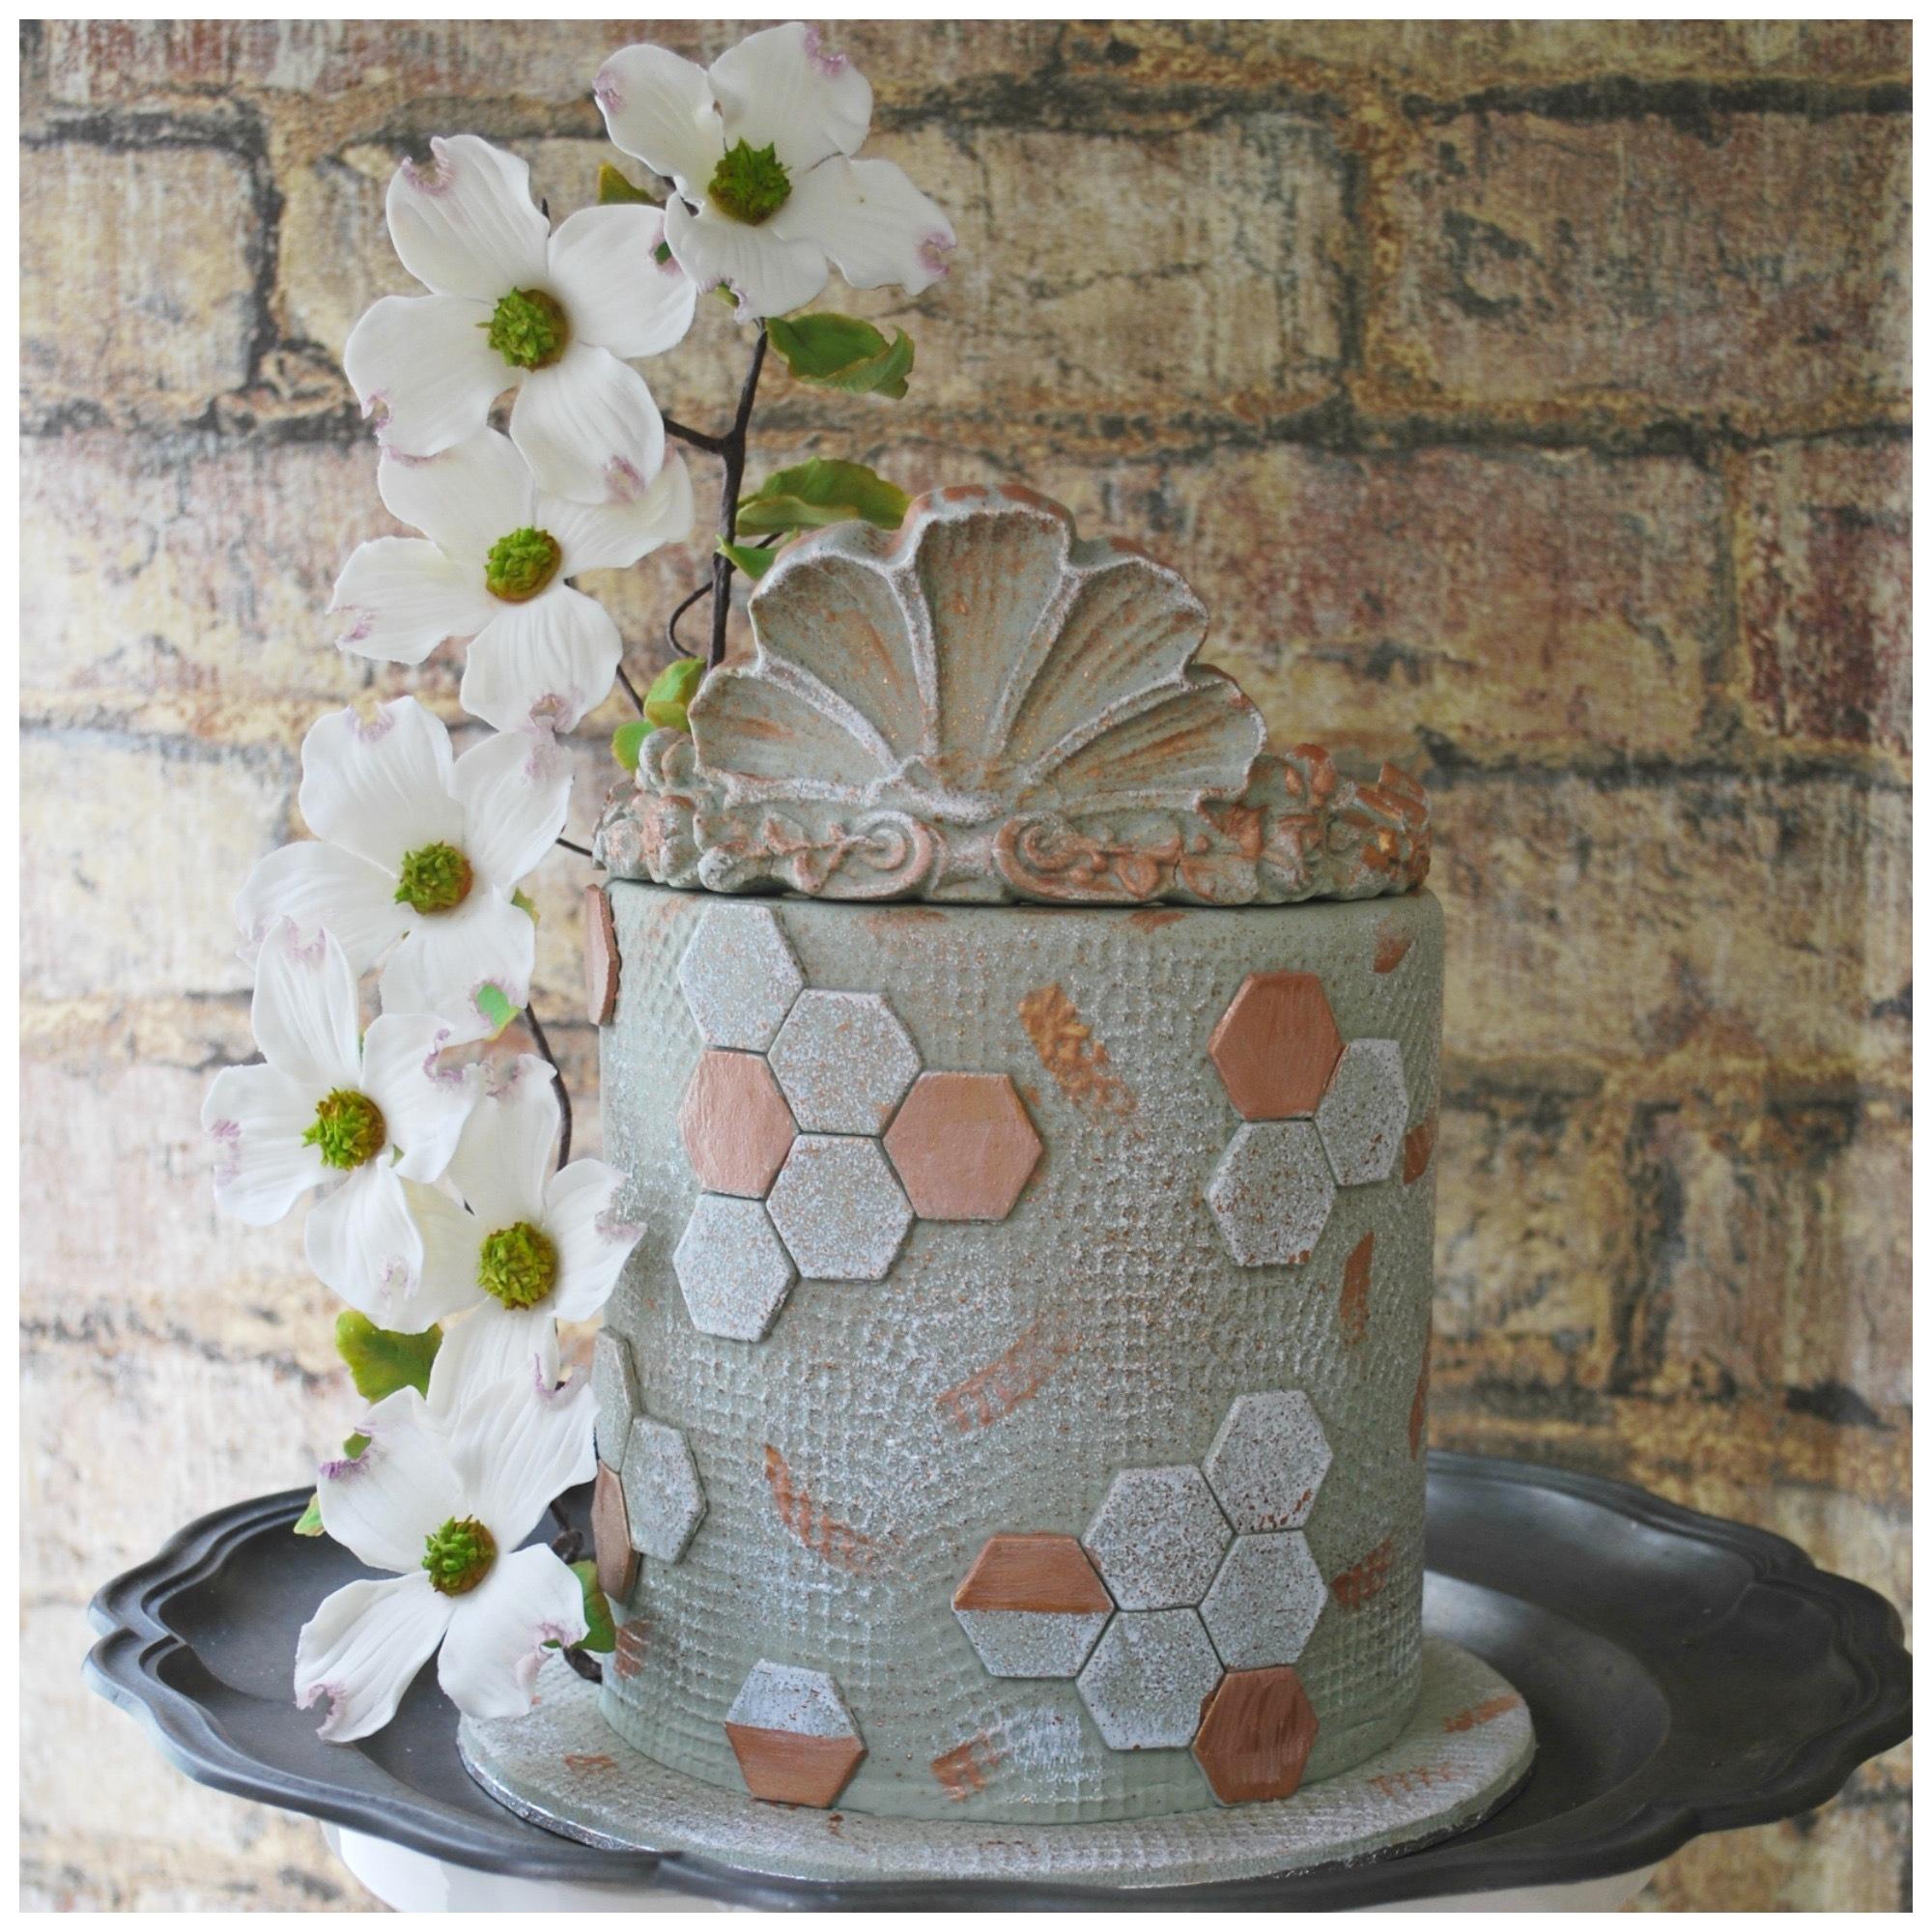 Mini gray geometric patterned wedding